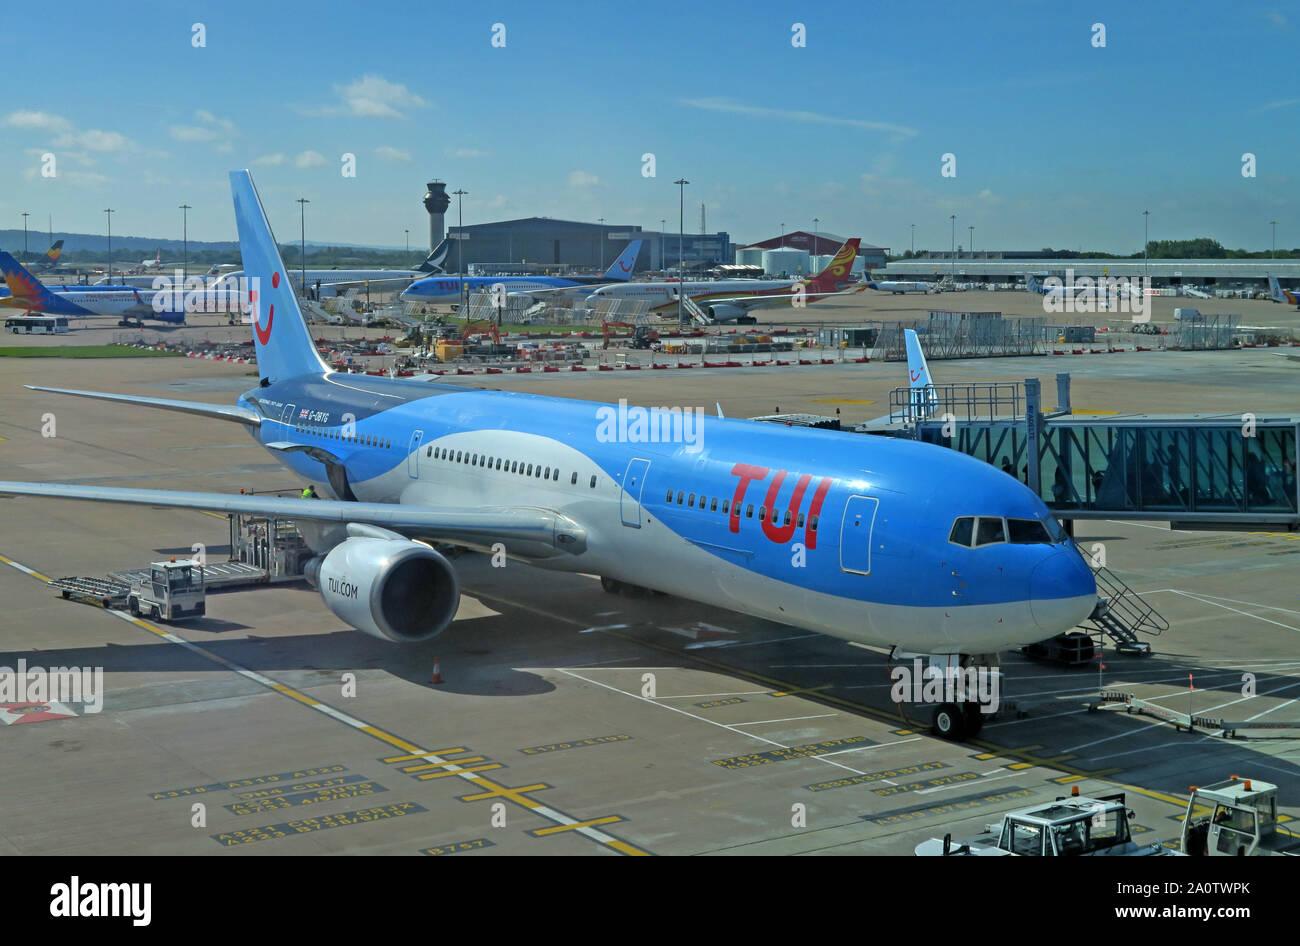 GoTonySmith,HotpixUK,@HotpixUK,MAN,MAG,apron,planes,jet,Boeing,Airbus,taxi,taxing,Ringway,UK,England,North West,TUI Aircraft,TUI Plane,TUIFly,TUI AG,tourism,charter,holiday,parked planes,Thomson Travel,Thomson,Hannover,family holidays,disruption,strike,G-OGYG,Boeing 757-300,G-OGYG tui 757-300,757-300,TUI Airways,Thomson Airways,Thomsonfly